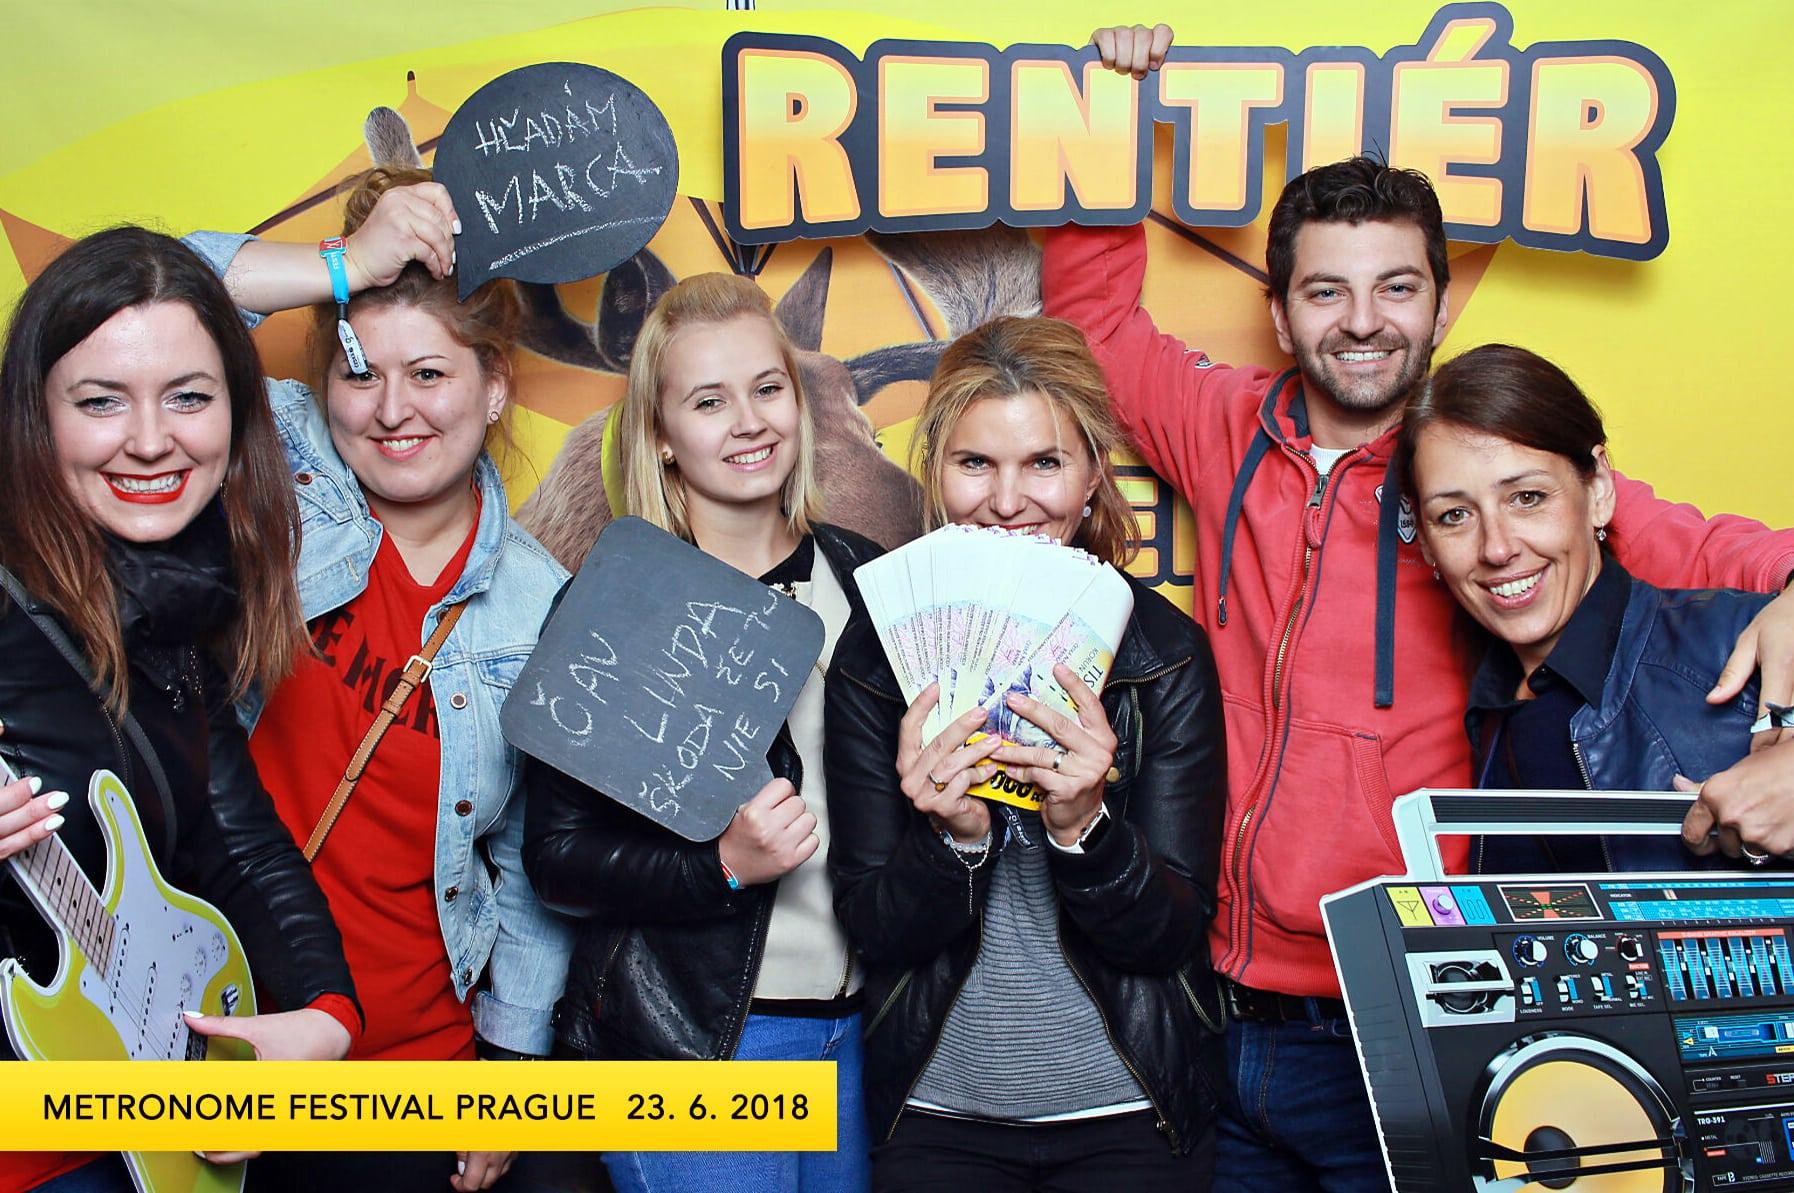 fotokoutek-rentier-metronome-festival-23-6-2018-445524